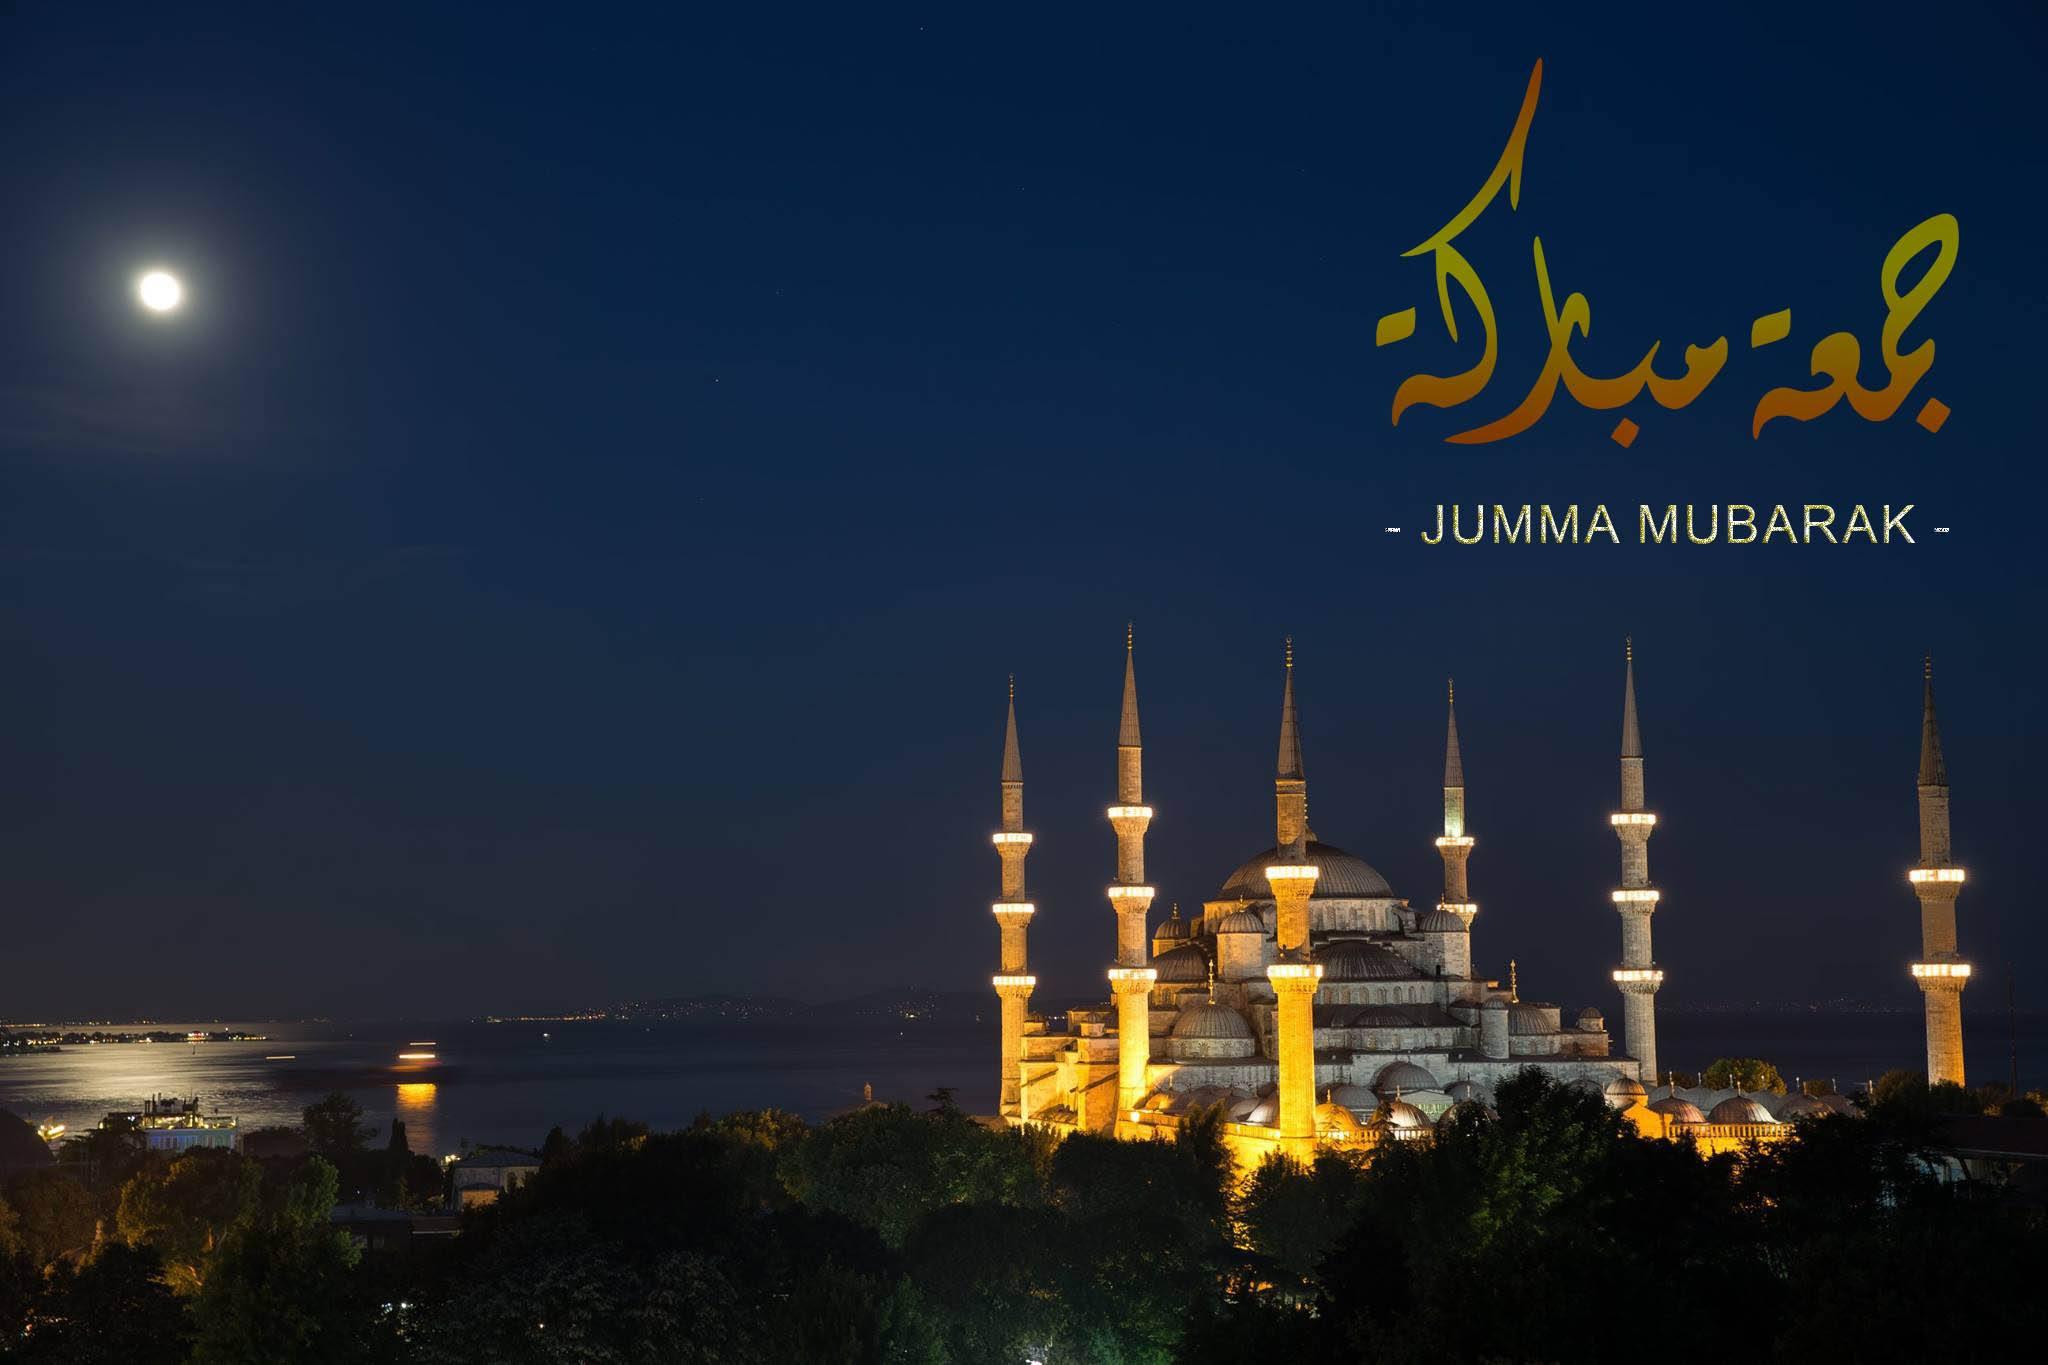 50 best jumma mubarak sms messages and wallpapers jumma mubarak wallpapers 3 m4hsunfo